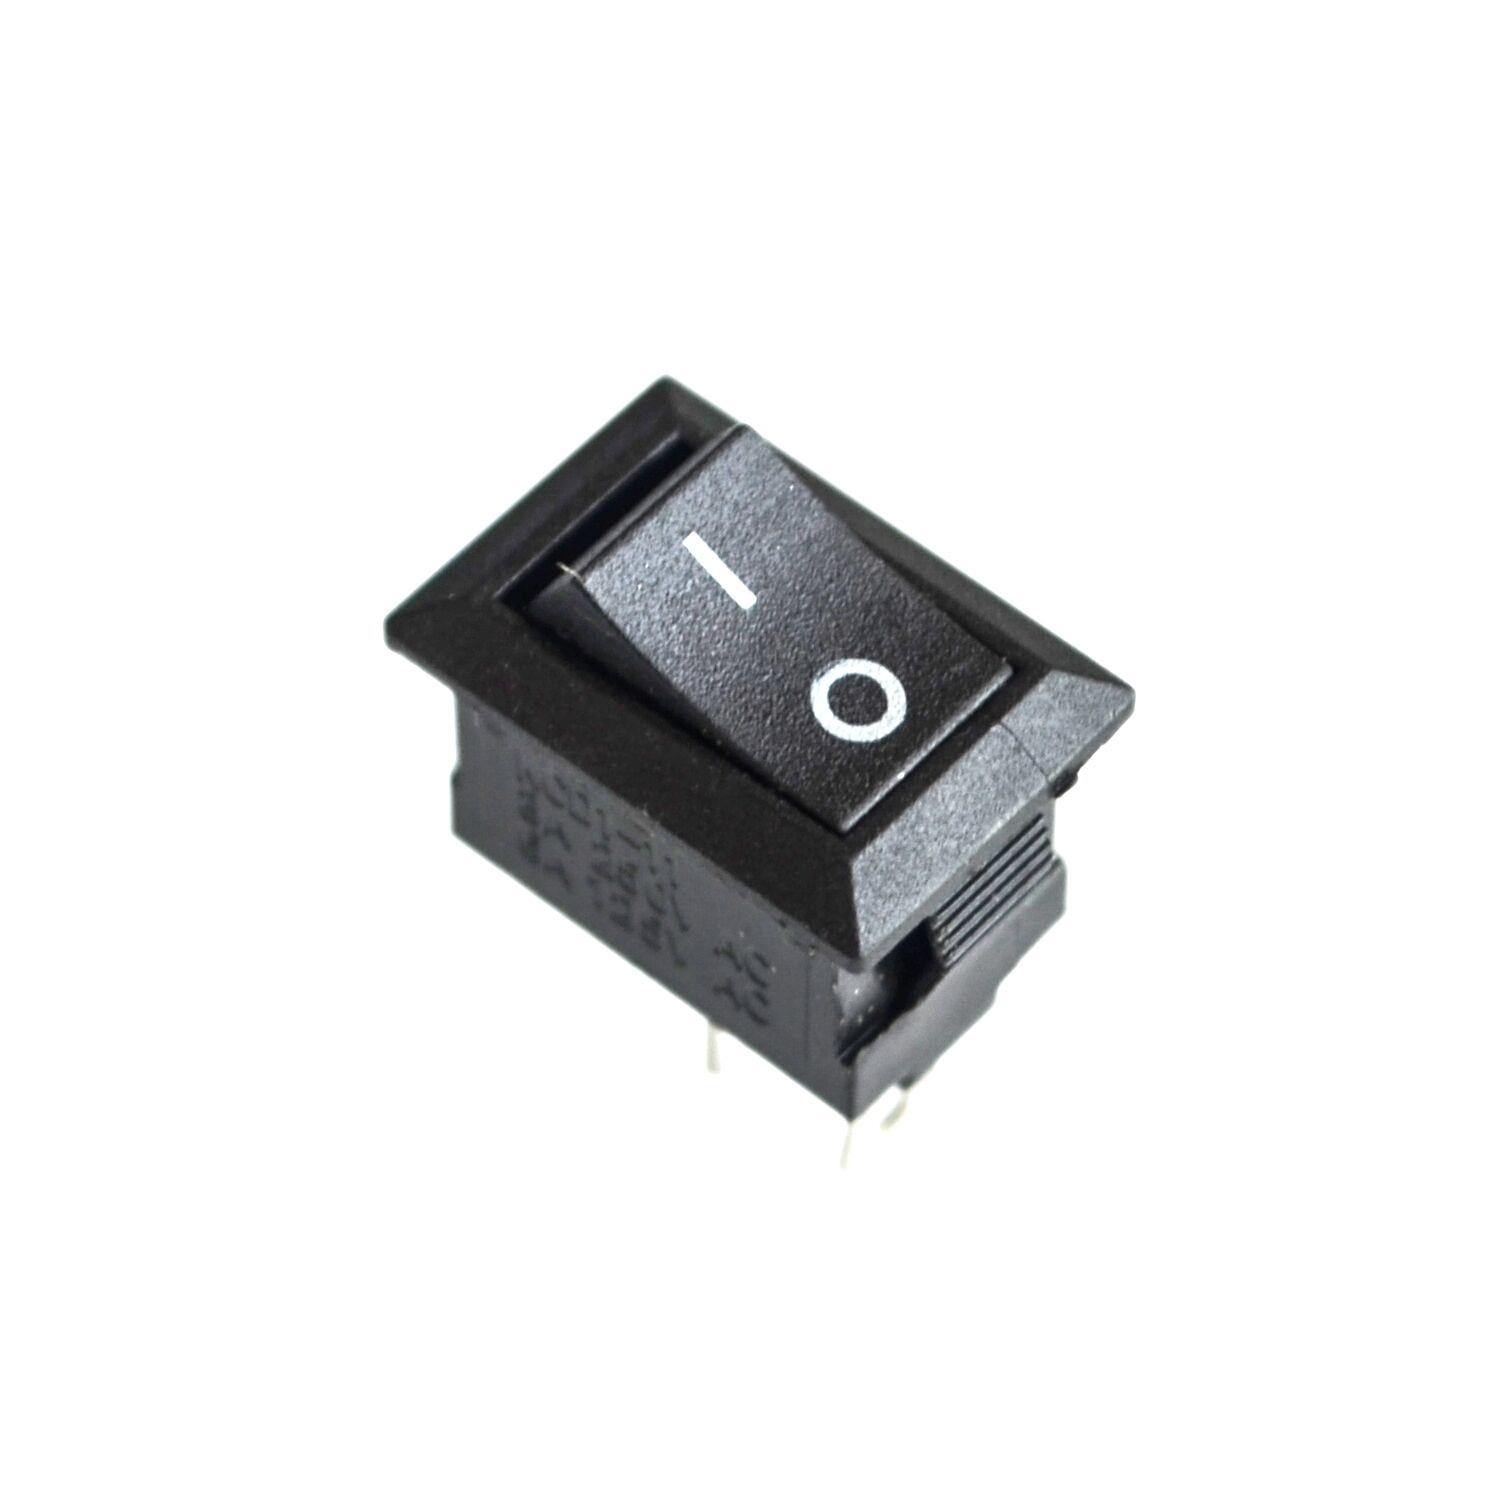 10pcs ON / OFF Rocker Switch, 117S 2-Pin 250V3A 125V6A ON-OFF Black Plastic 2 Pin